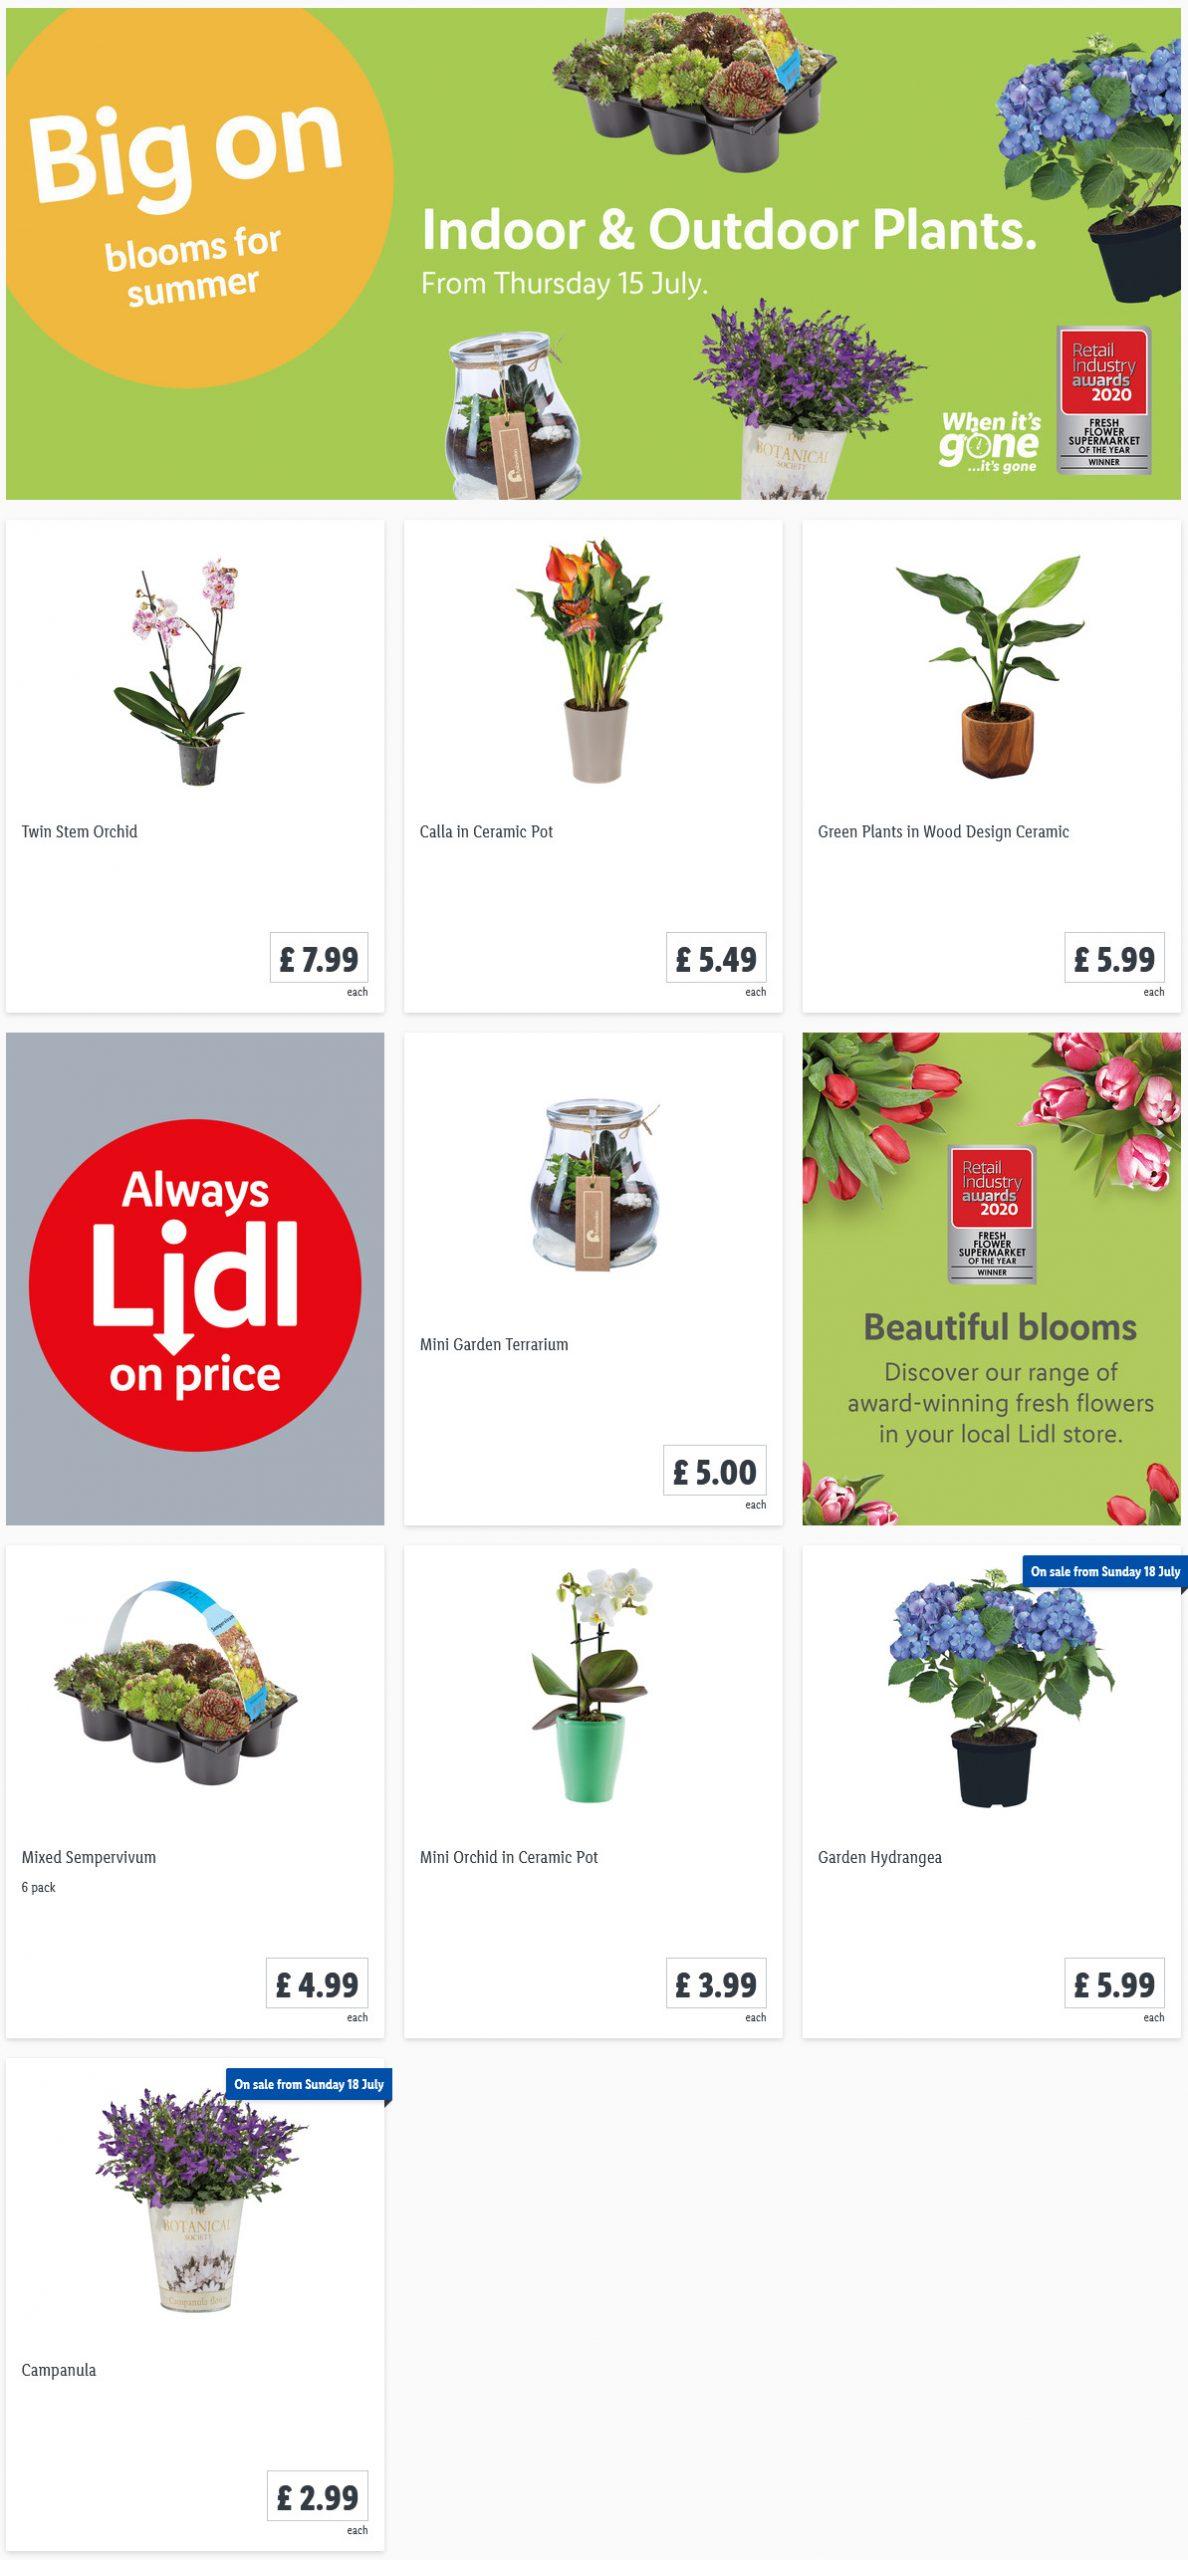 Preview LIDLIndoor & Outdoor Plants Offers for your garden valid from 15/7/2021